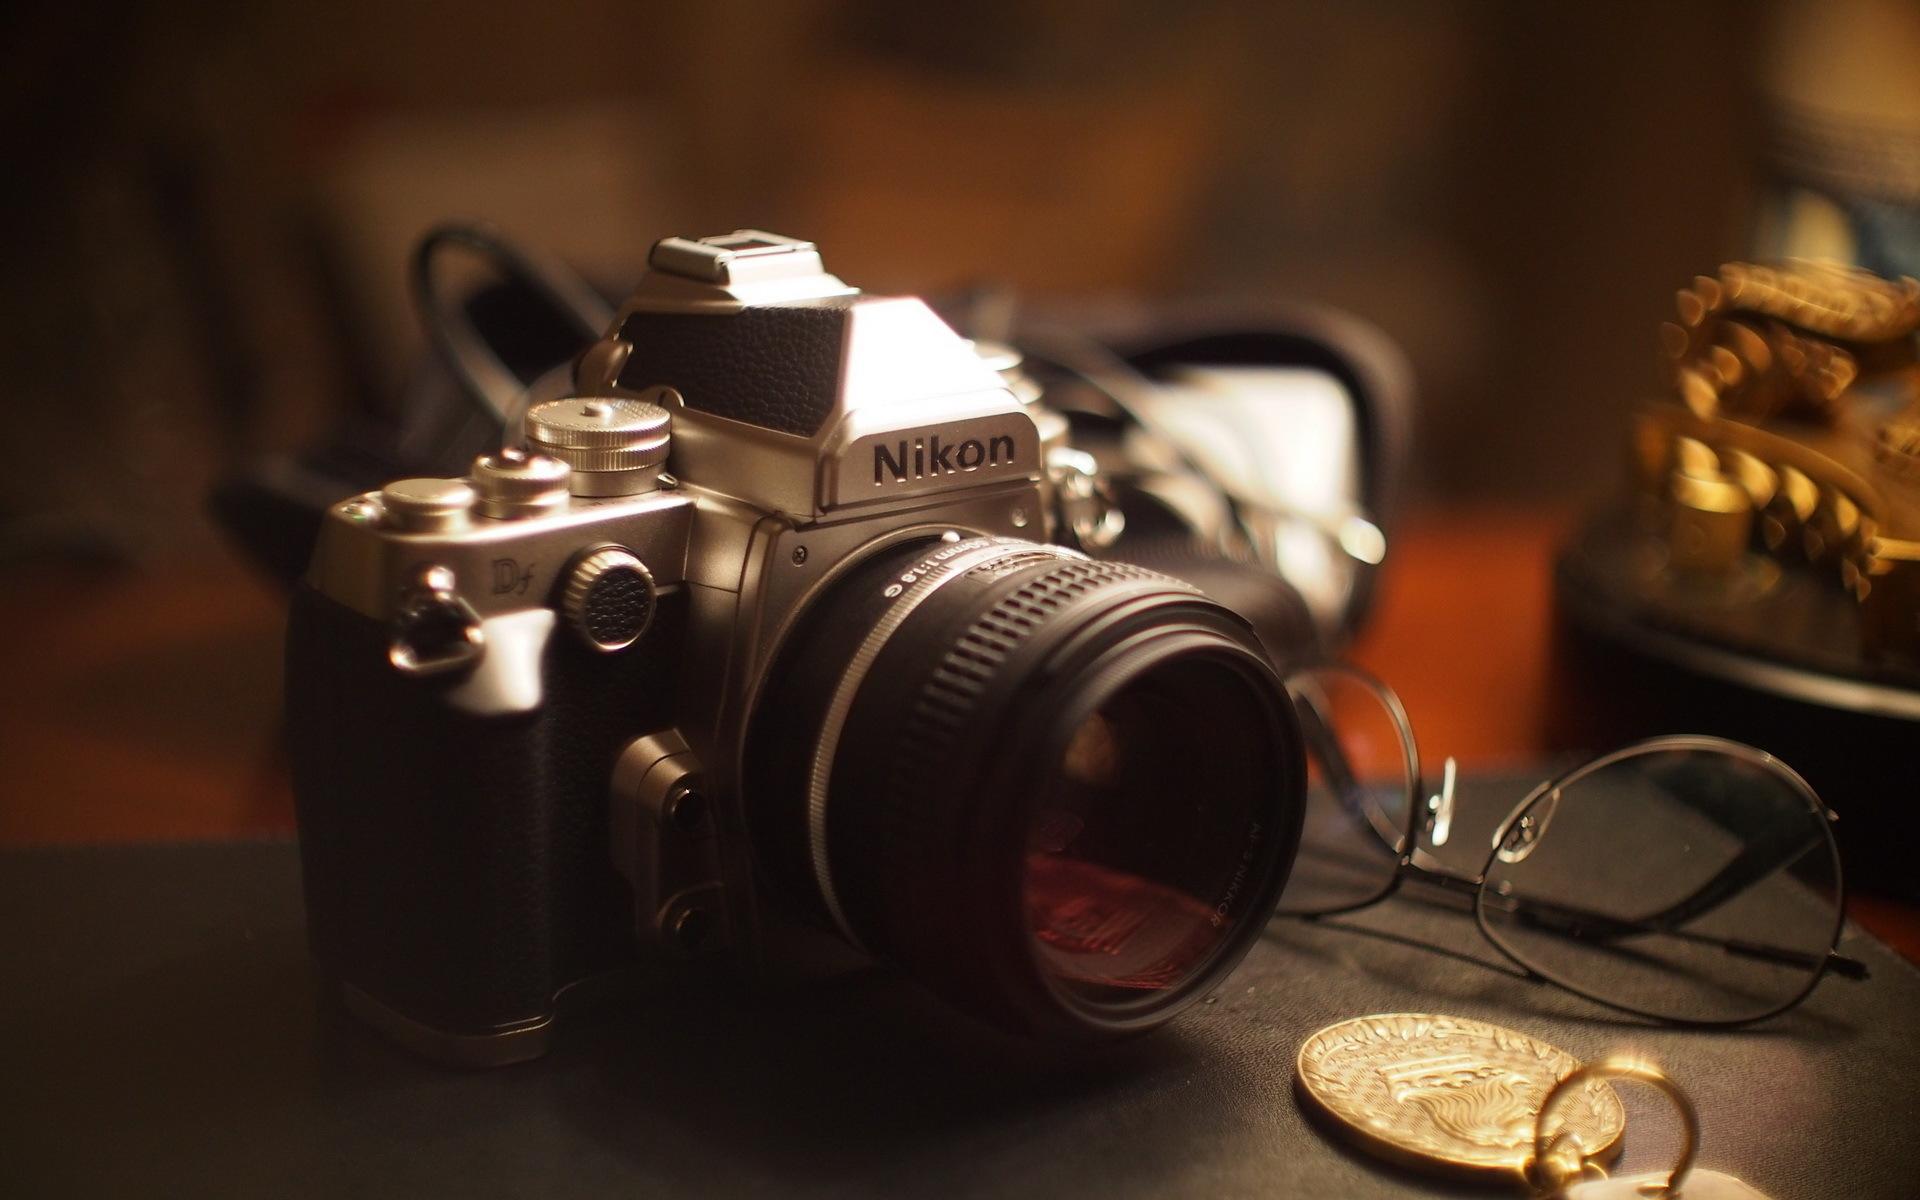 Фотоаппарат Nikon старый  № 3624460 загрузить